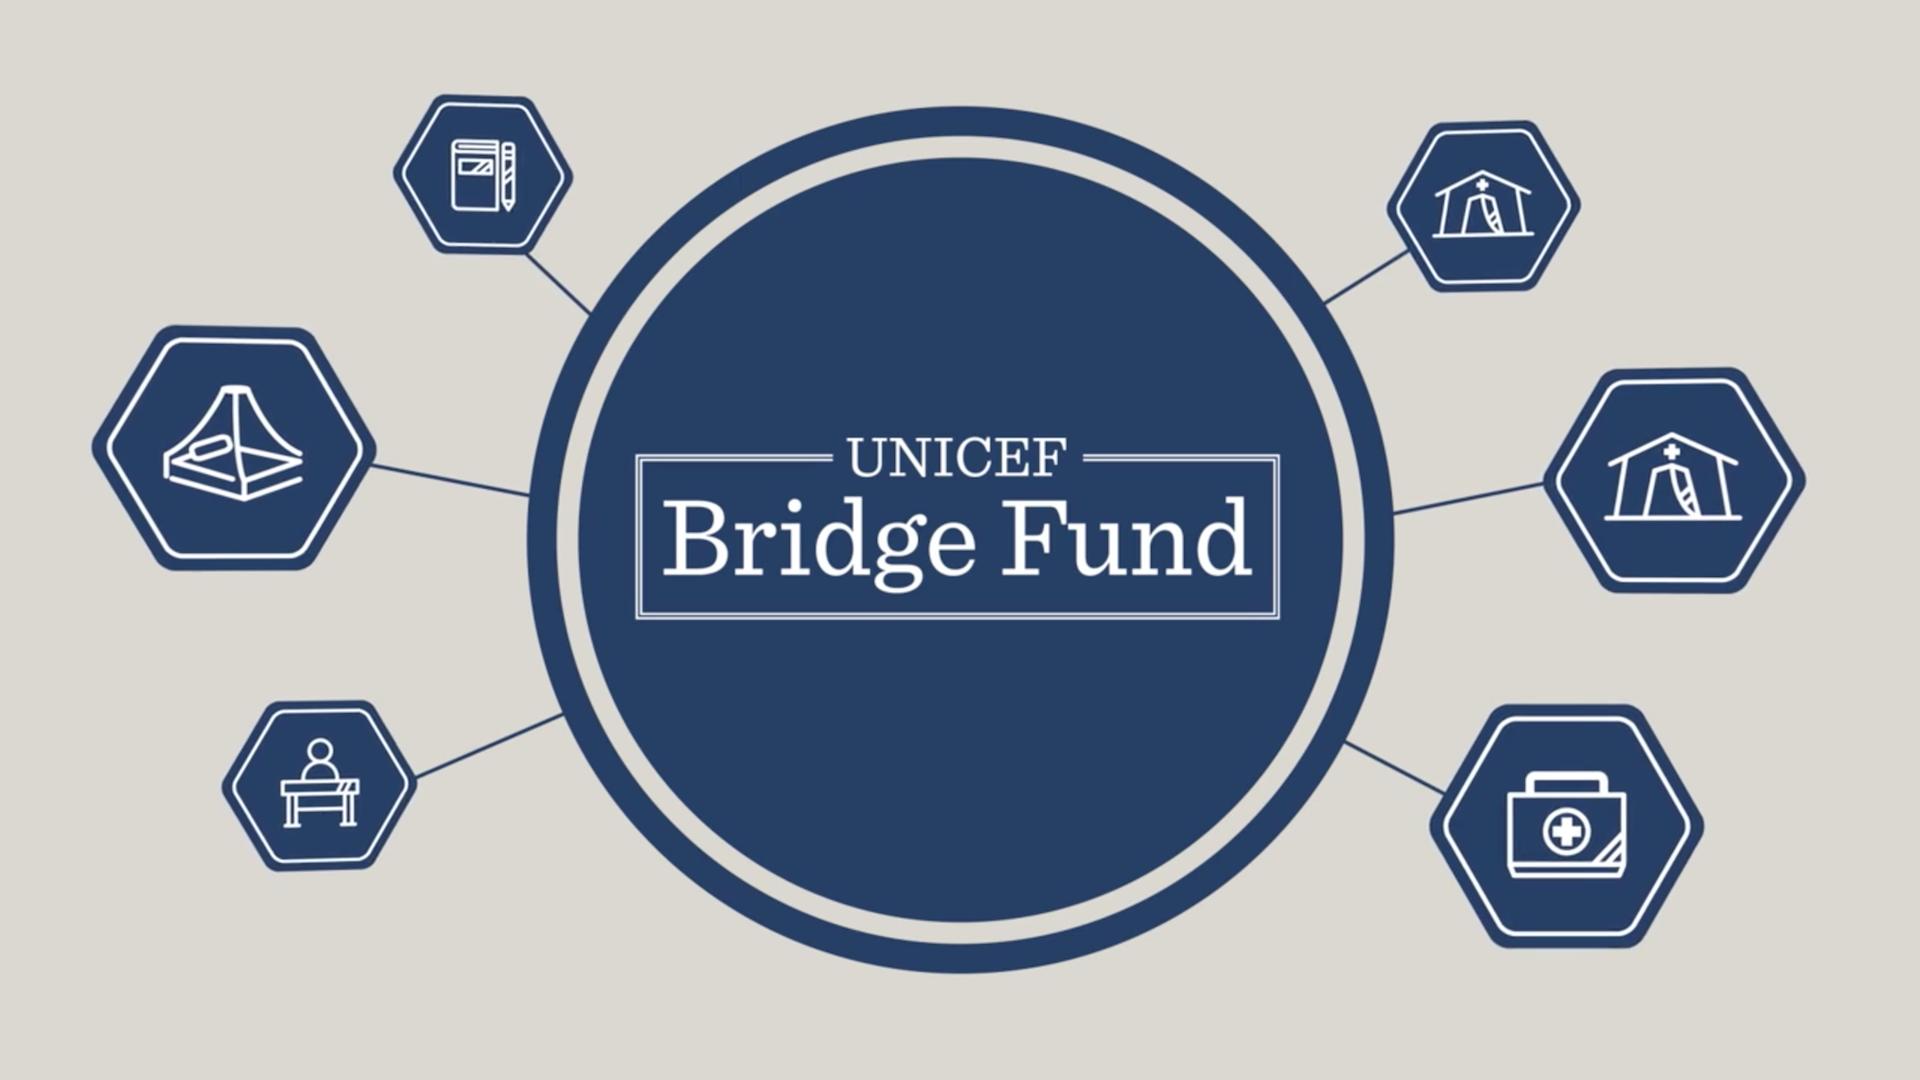 UNICEF Bridge Fund Video & Brochure